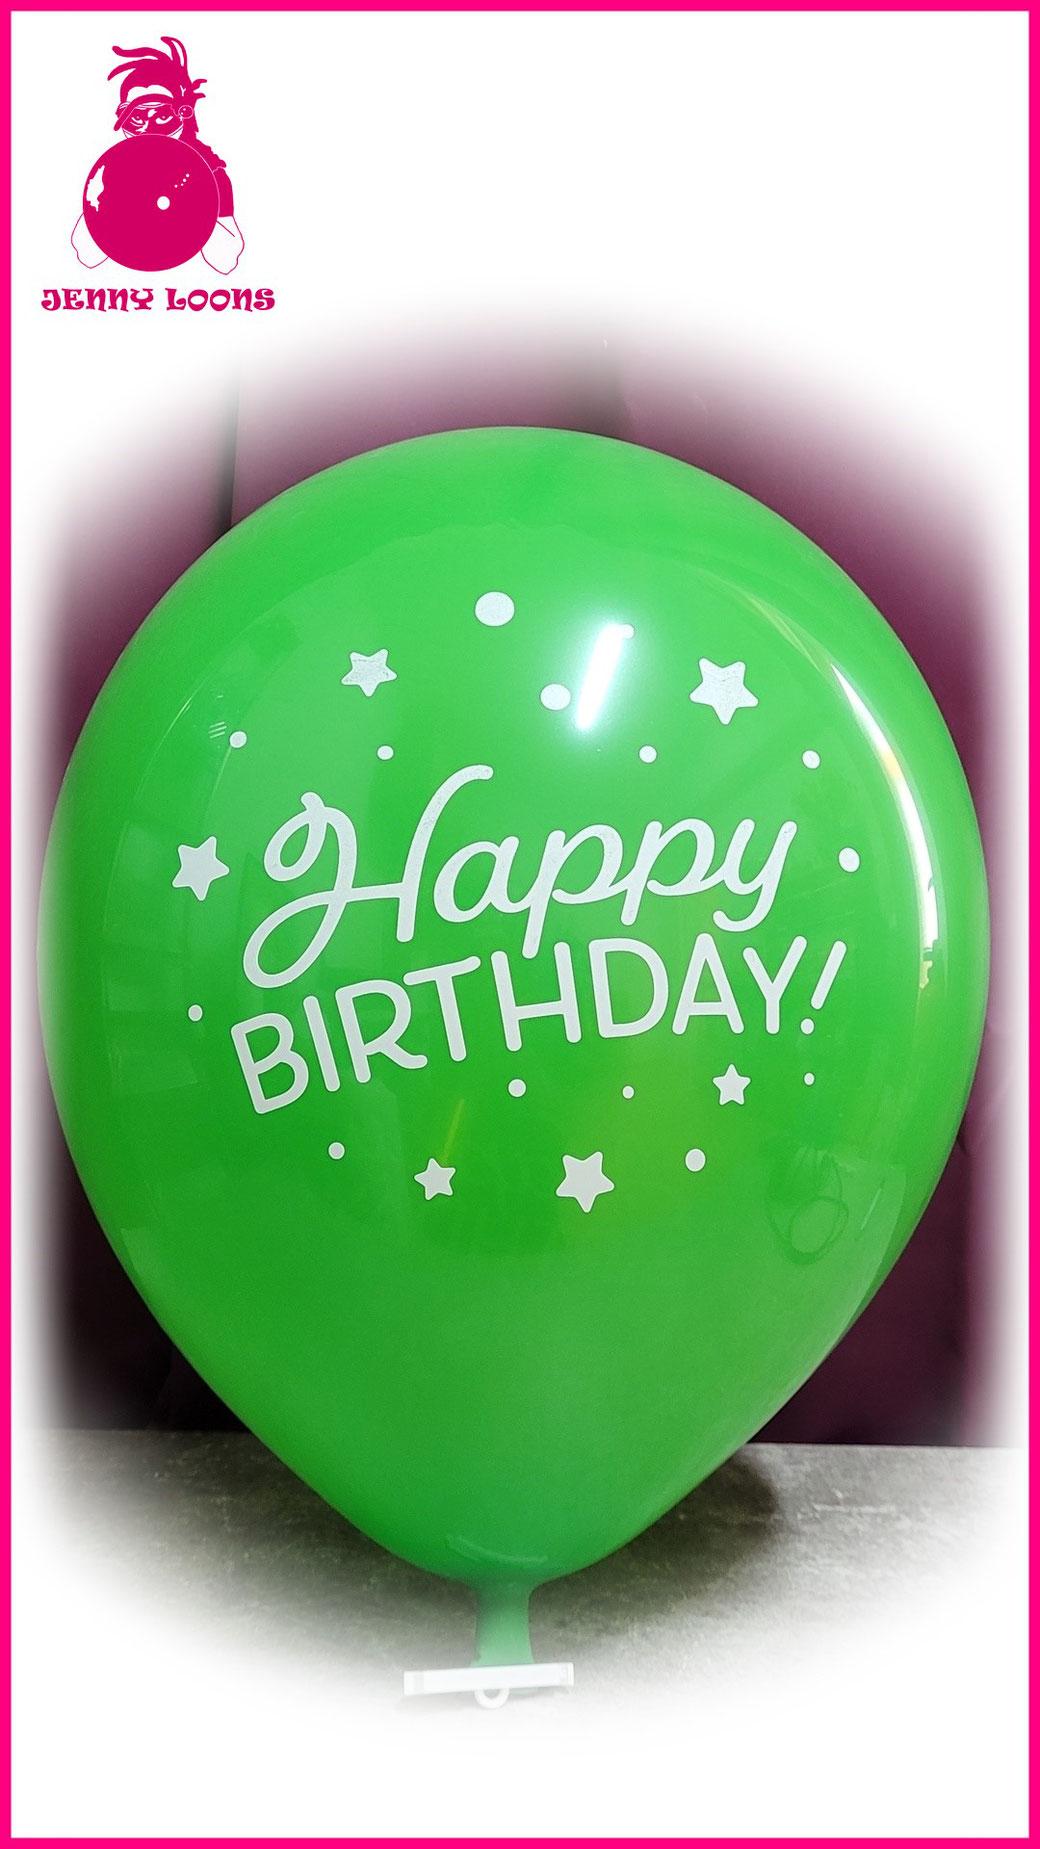 TUF-TEX TUFTEX Luftballon Happy Birthday HBD Fun 17zoll gross Latexballon Geburtstag